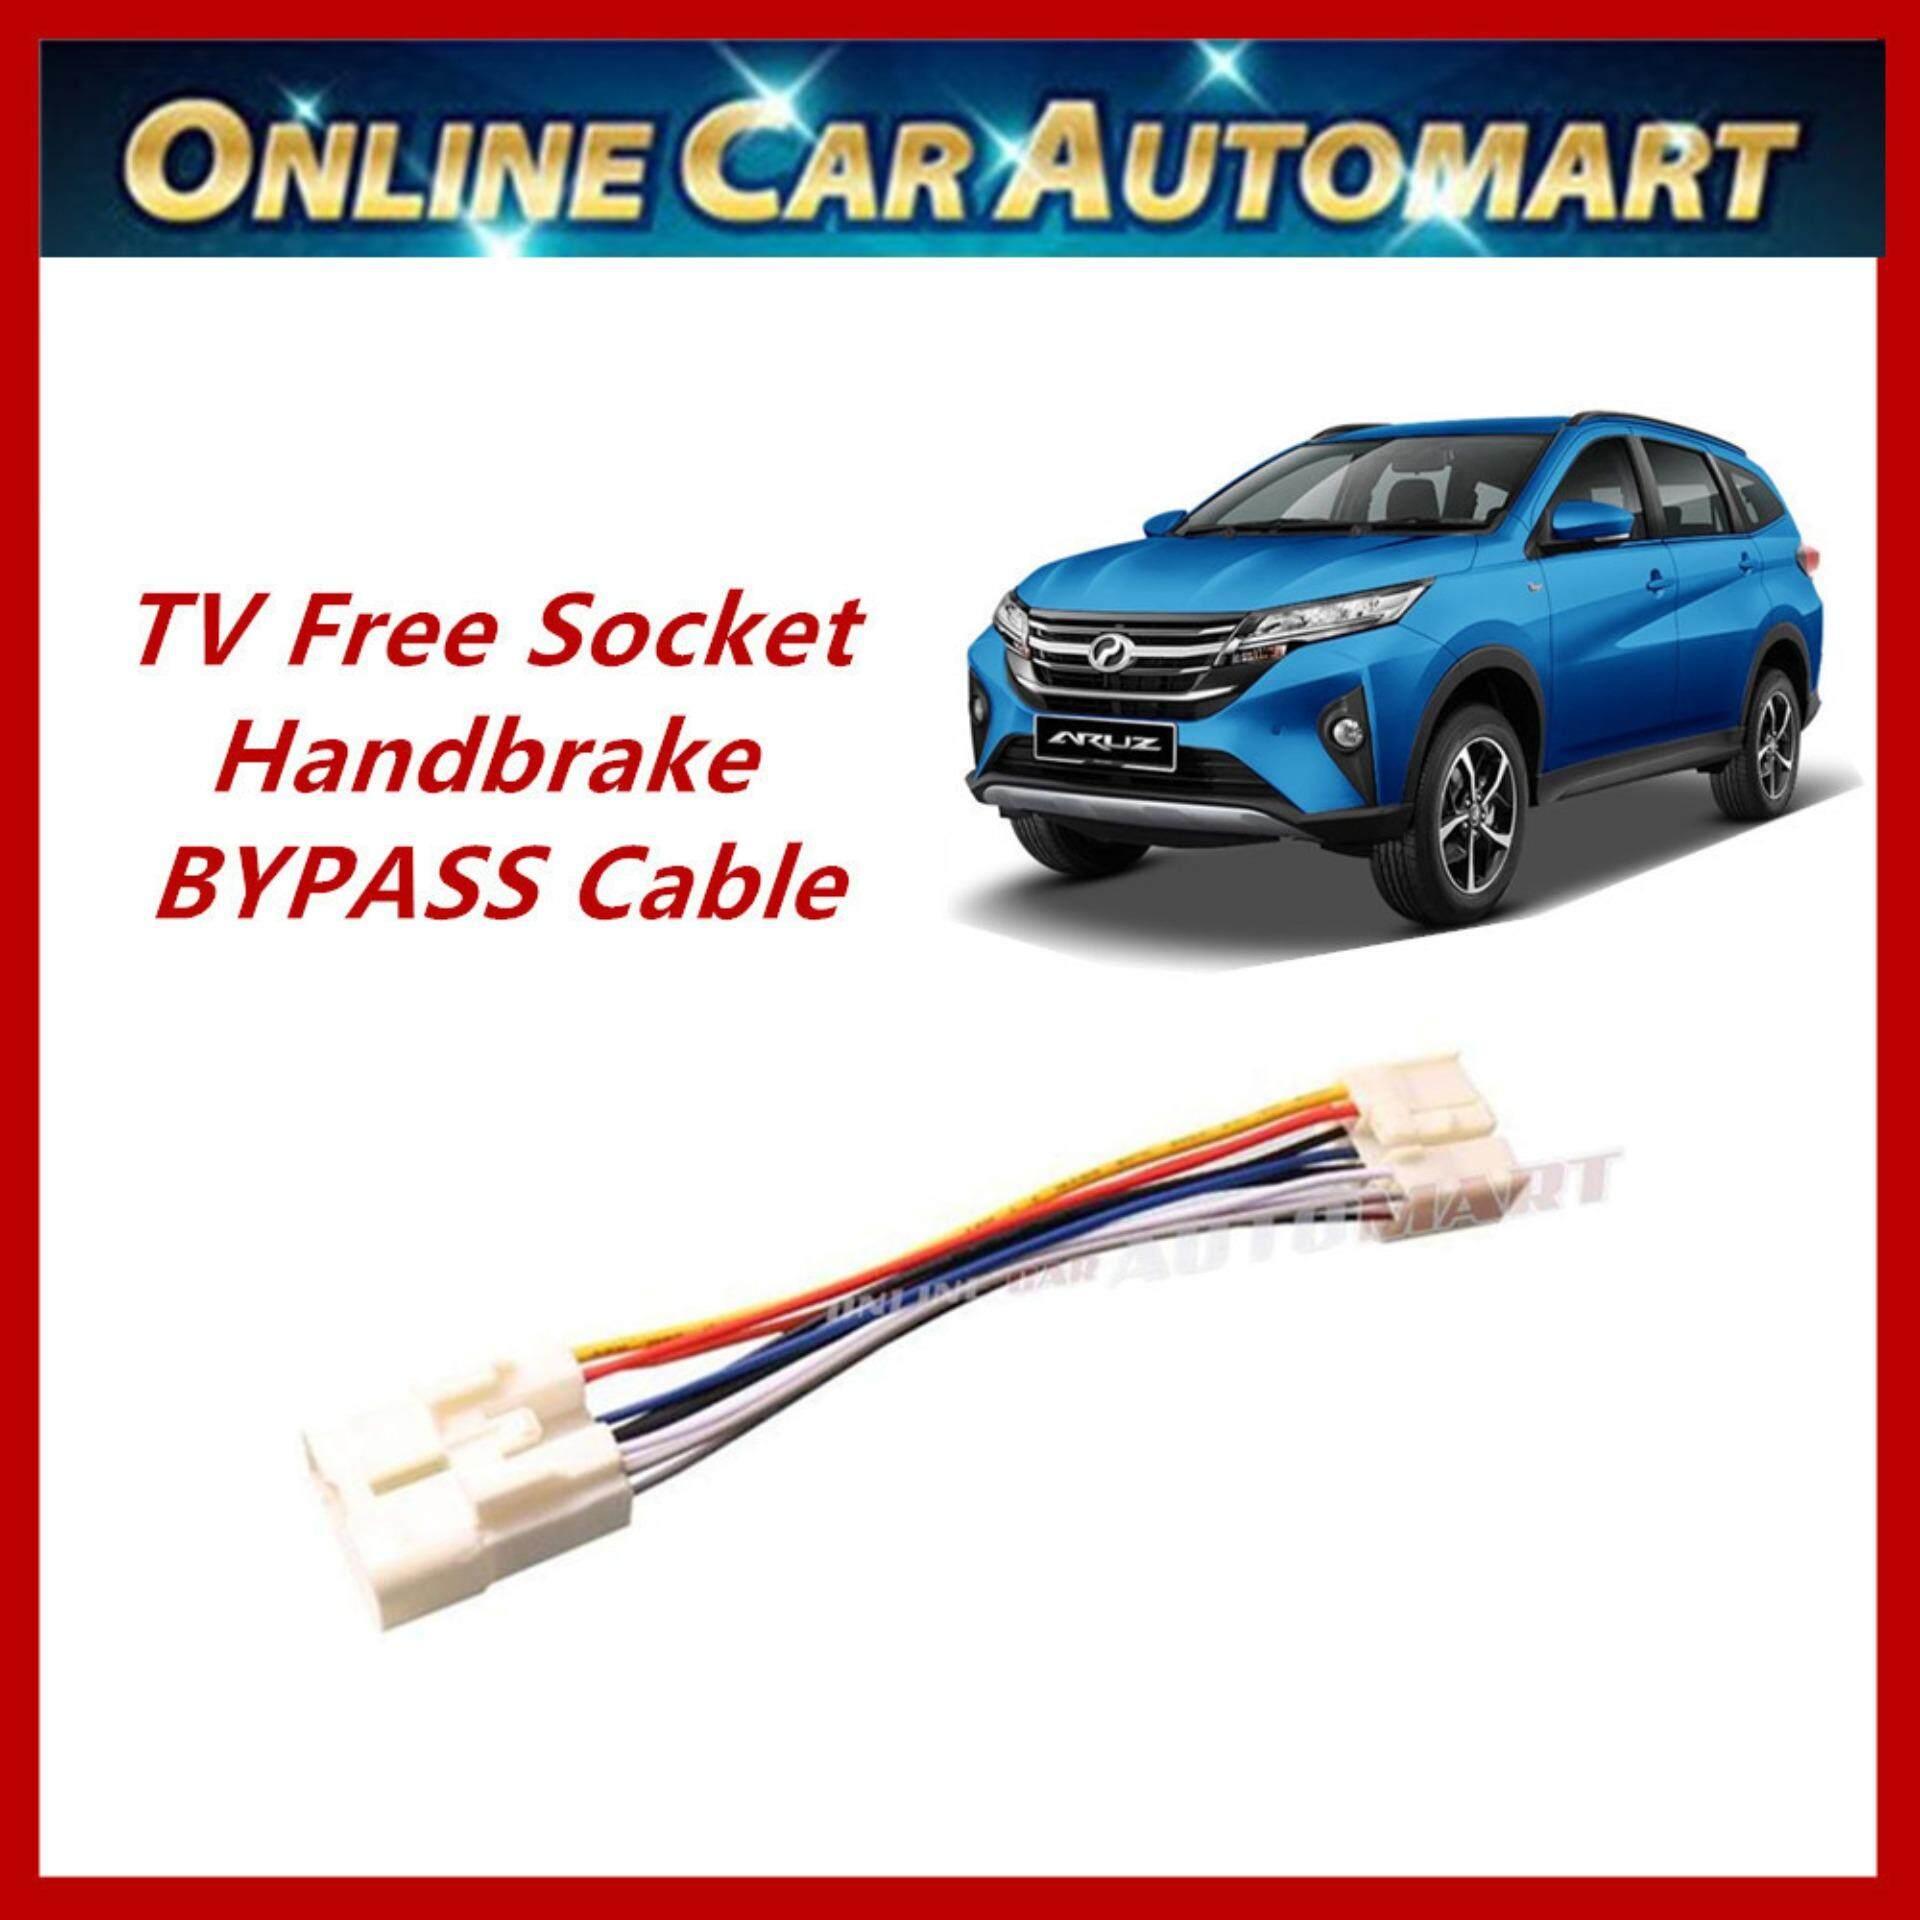 Perodua Aruz Plug n Play handbrake ByPass Car DVD Video While Driving In Motion (TV Free Socket)